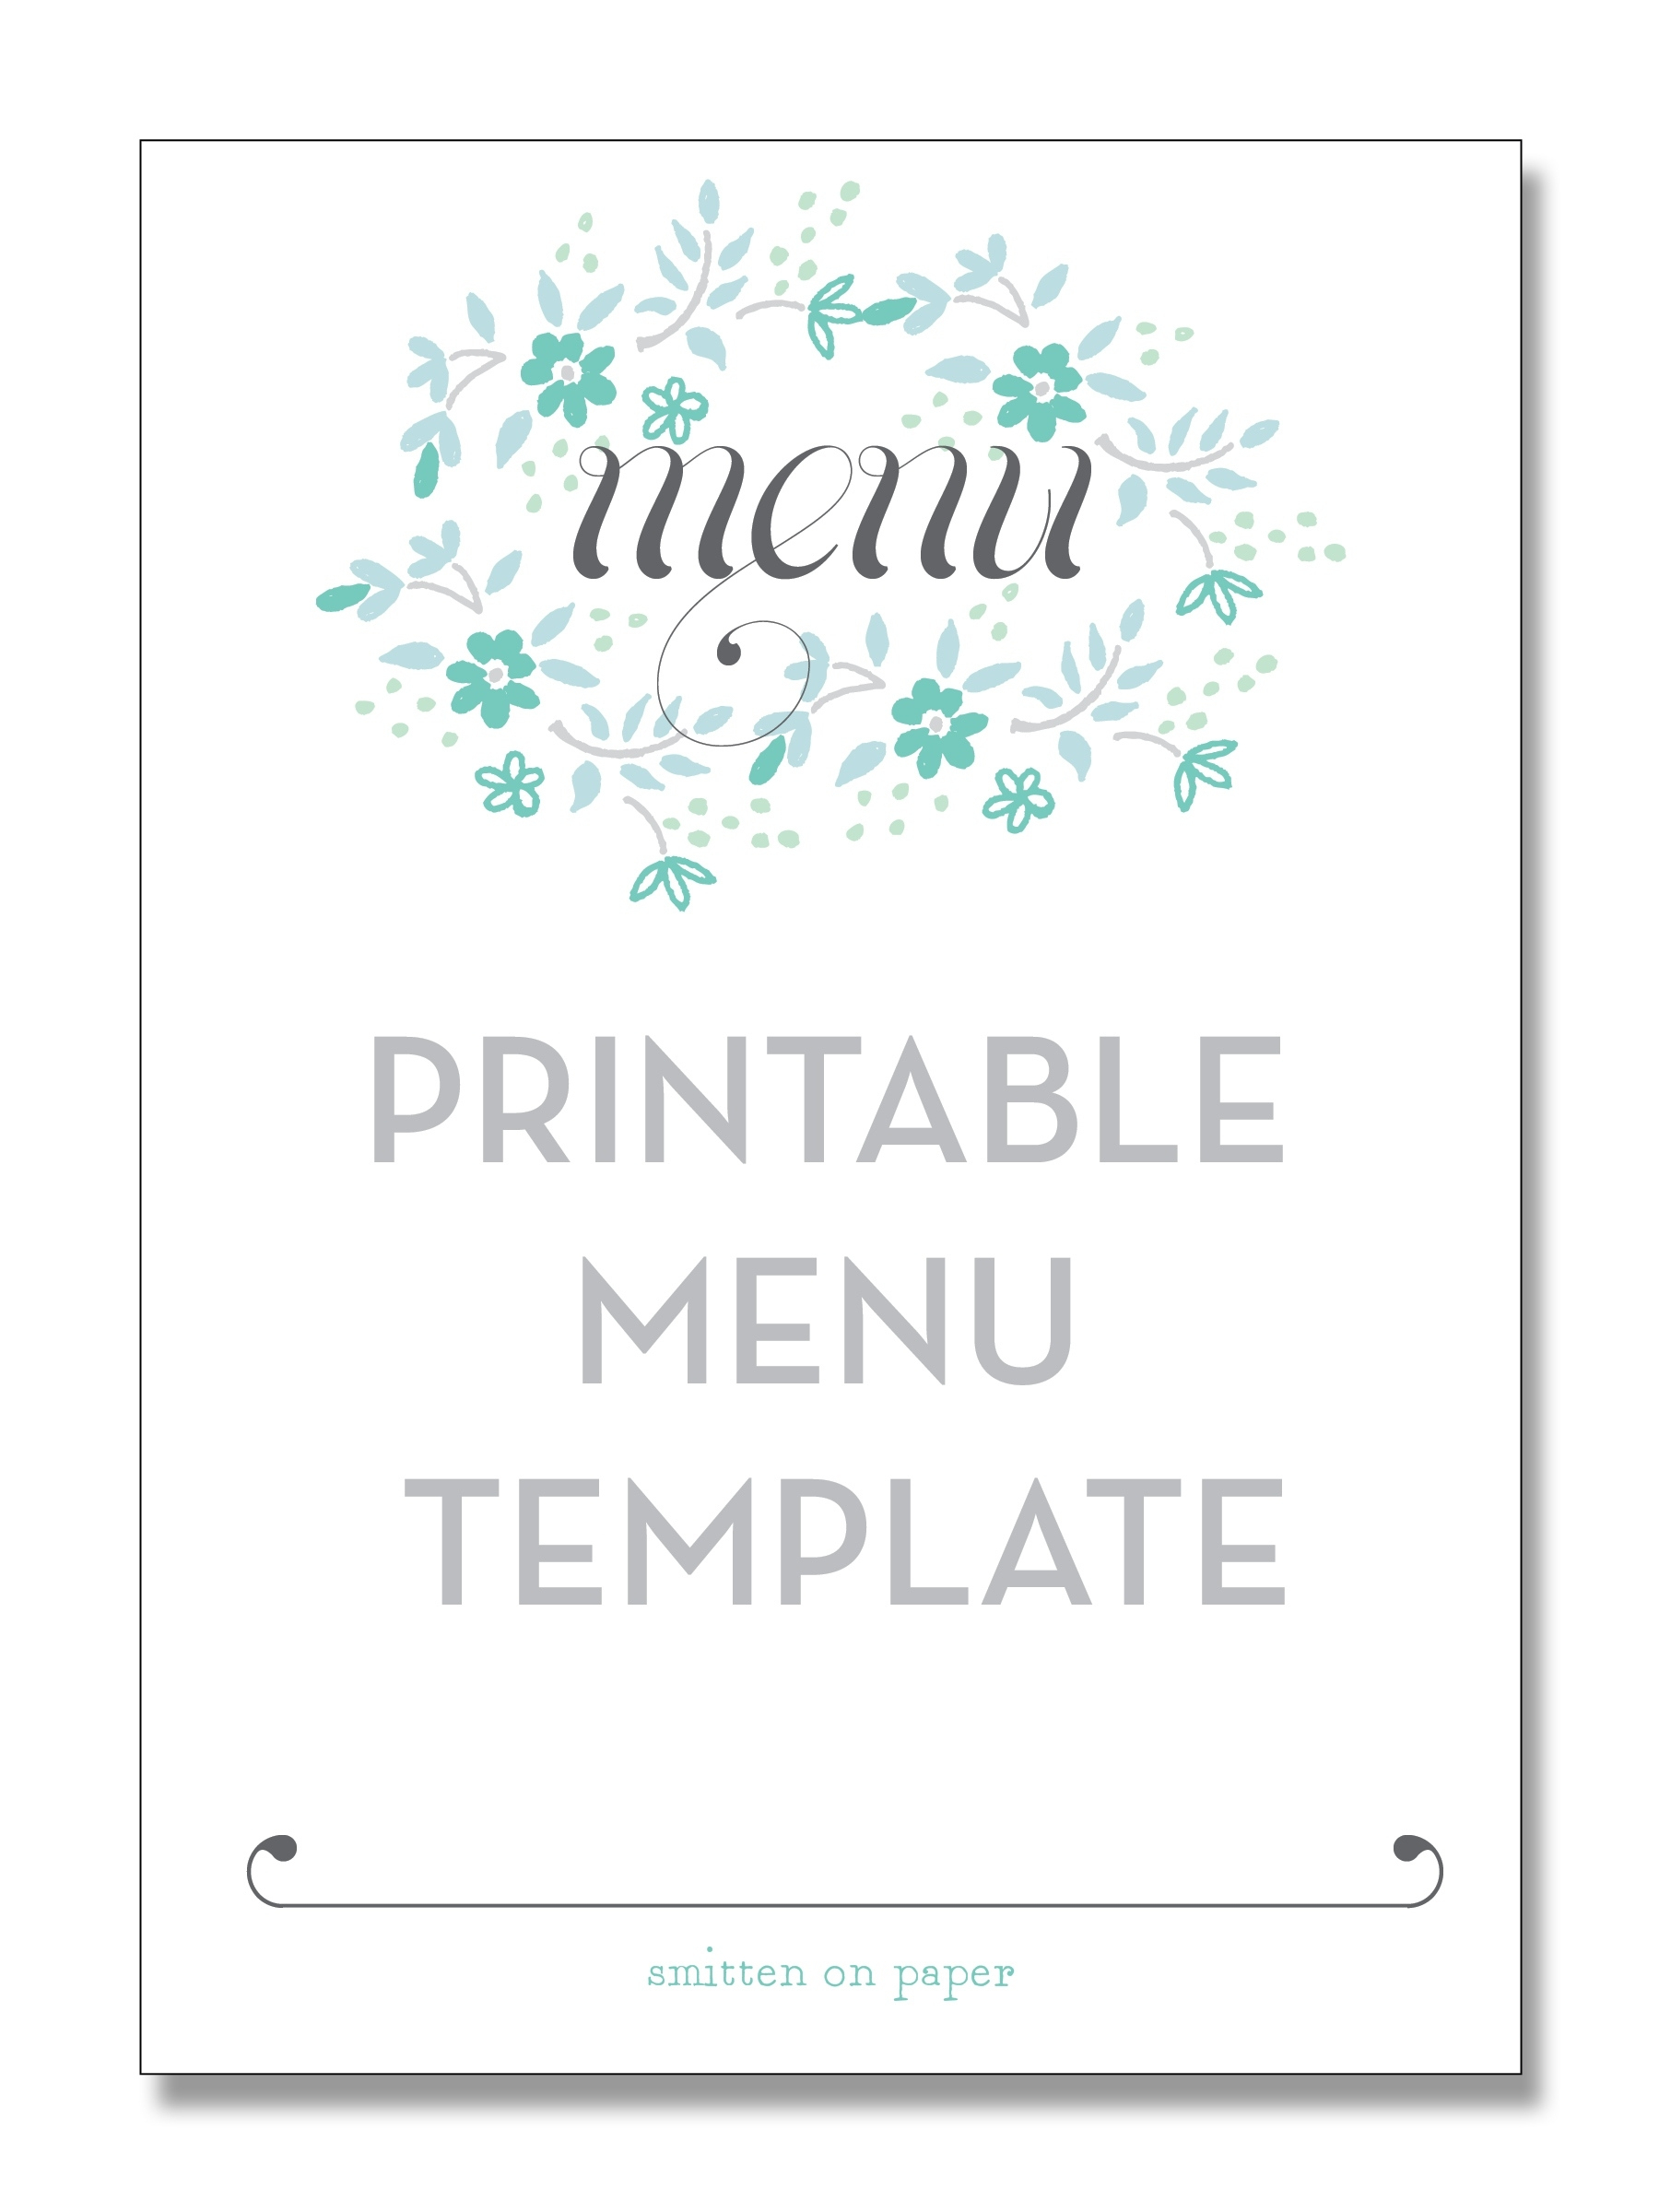 Free Printable Blank Menu Templates With Restaurant  Menus Pics - Free Online Printable Menu Maker